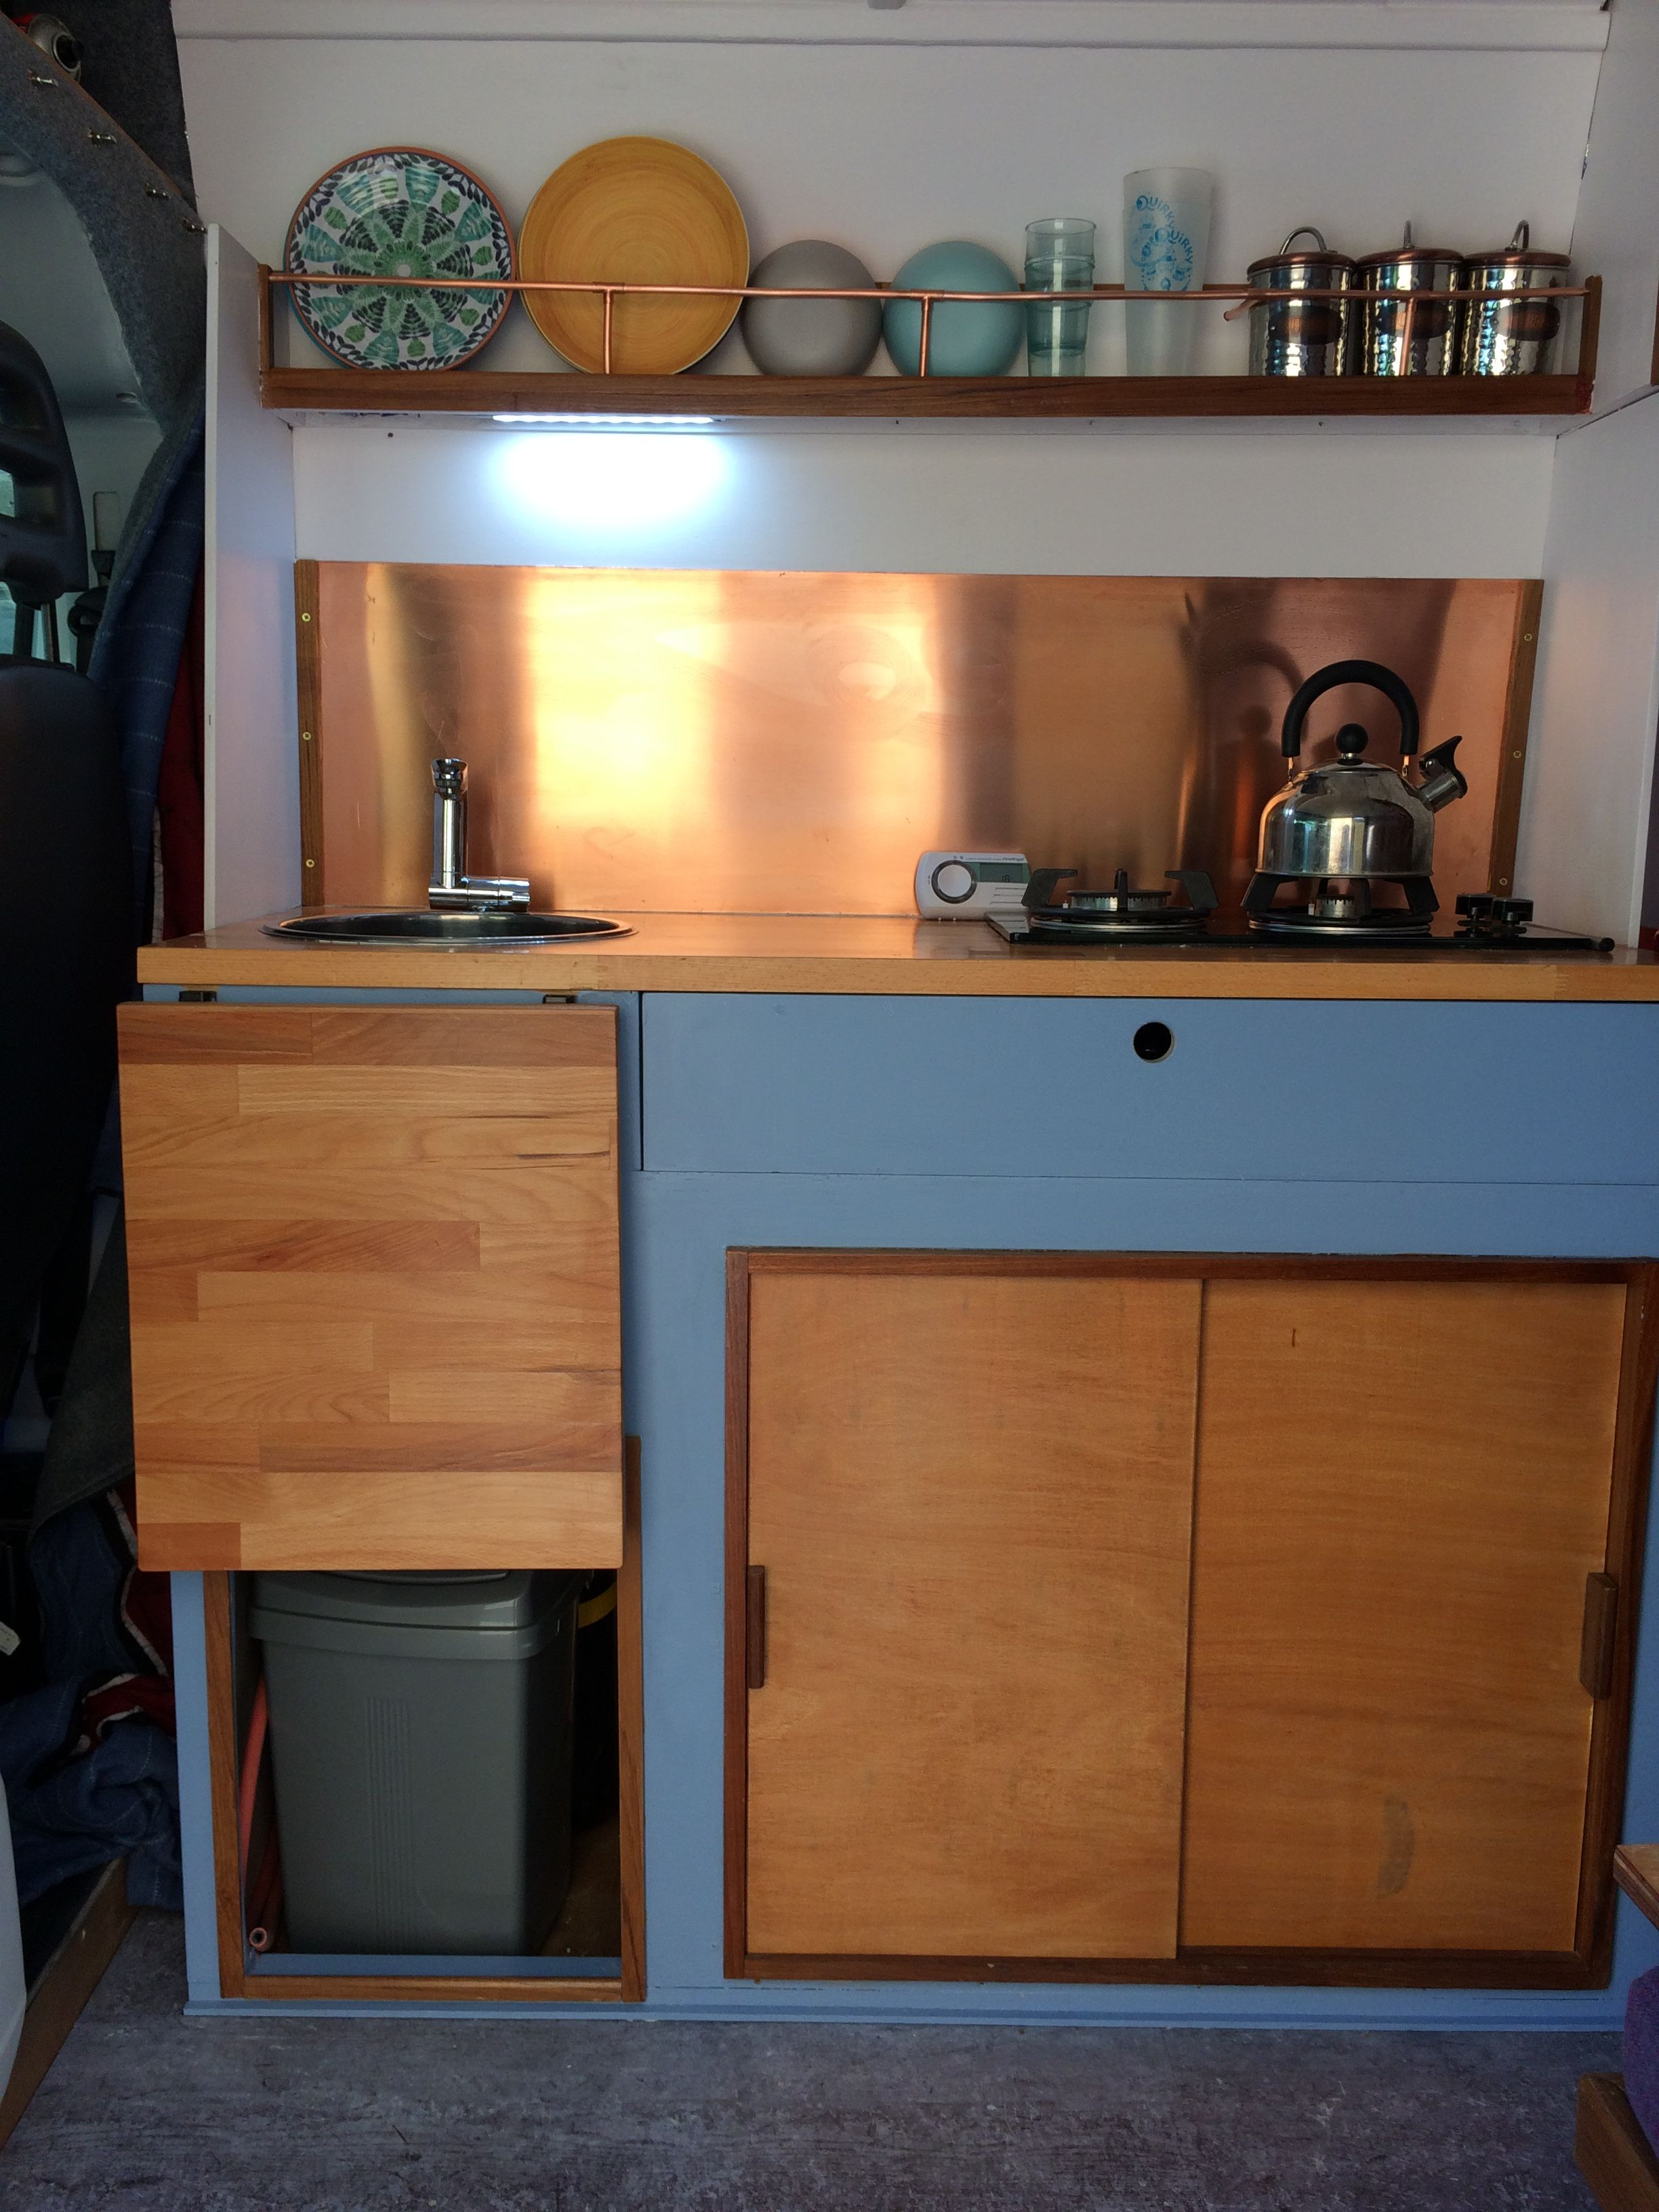 The Kitchen In Our Camper Van Vanlife Home Decor Kitchen Liquor Cabinet